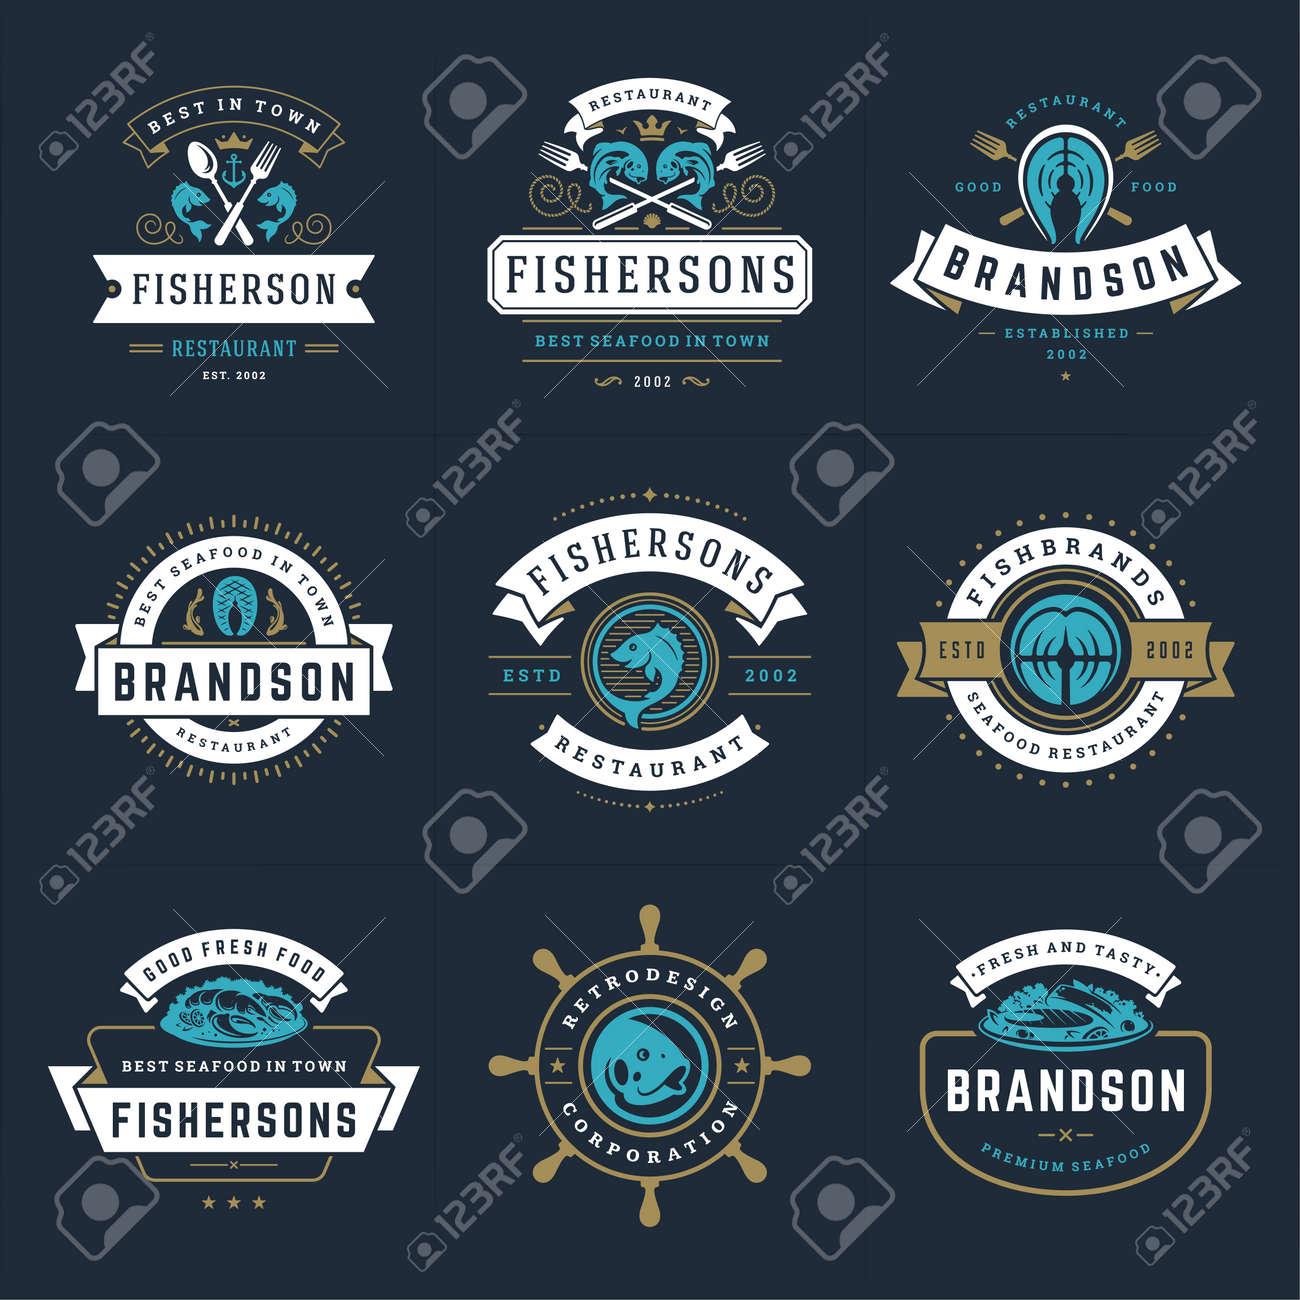 Seafood logos or signs set vector illustration fish market and restaurant emblems templates design - 165594320